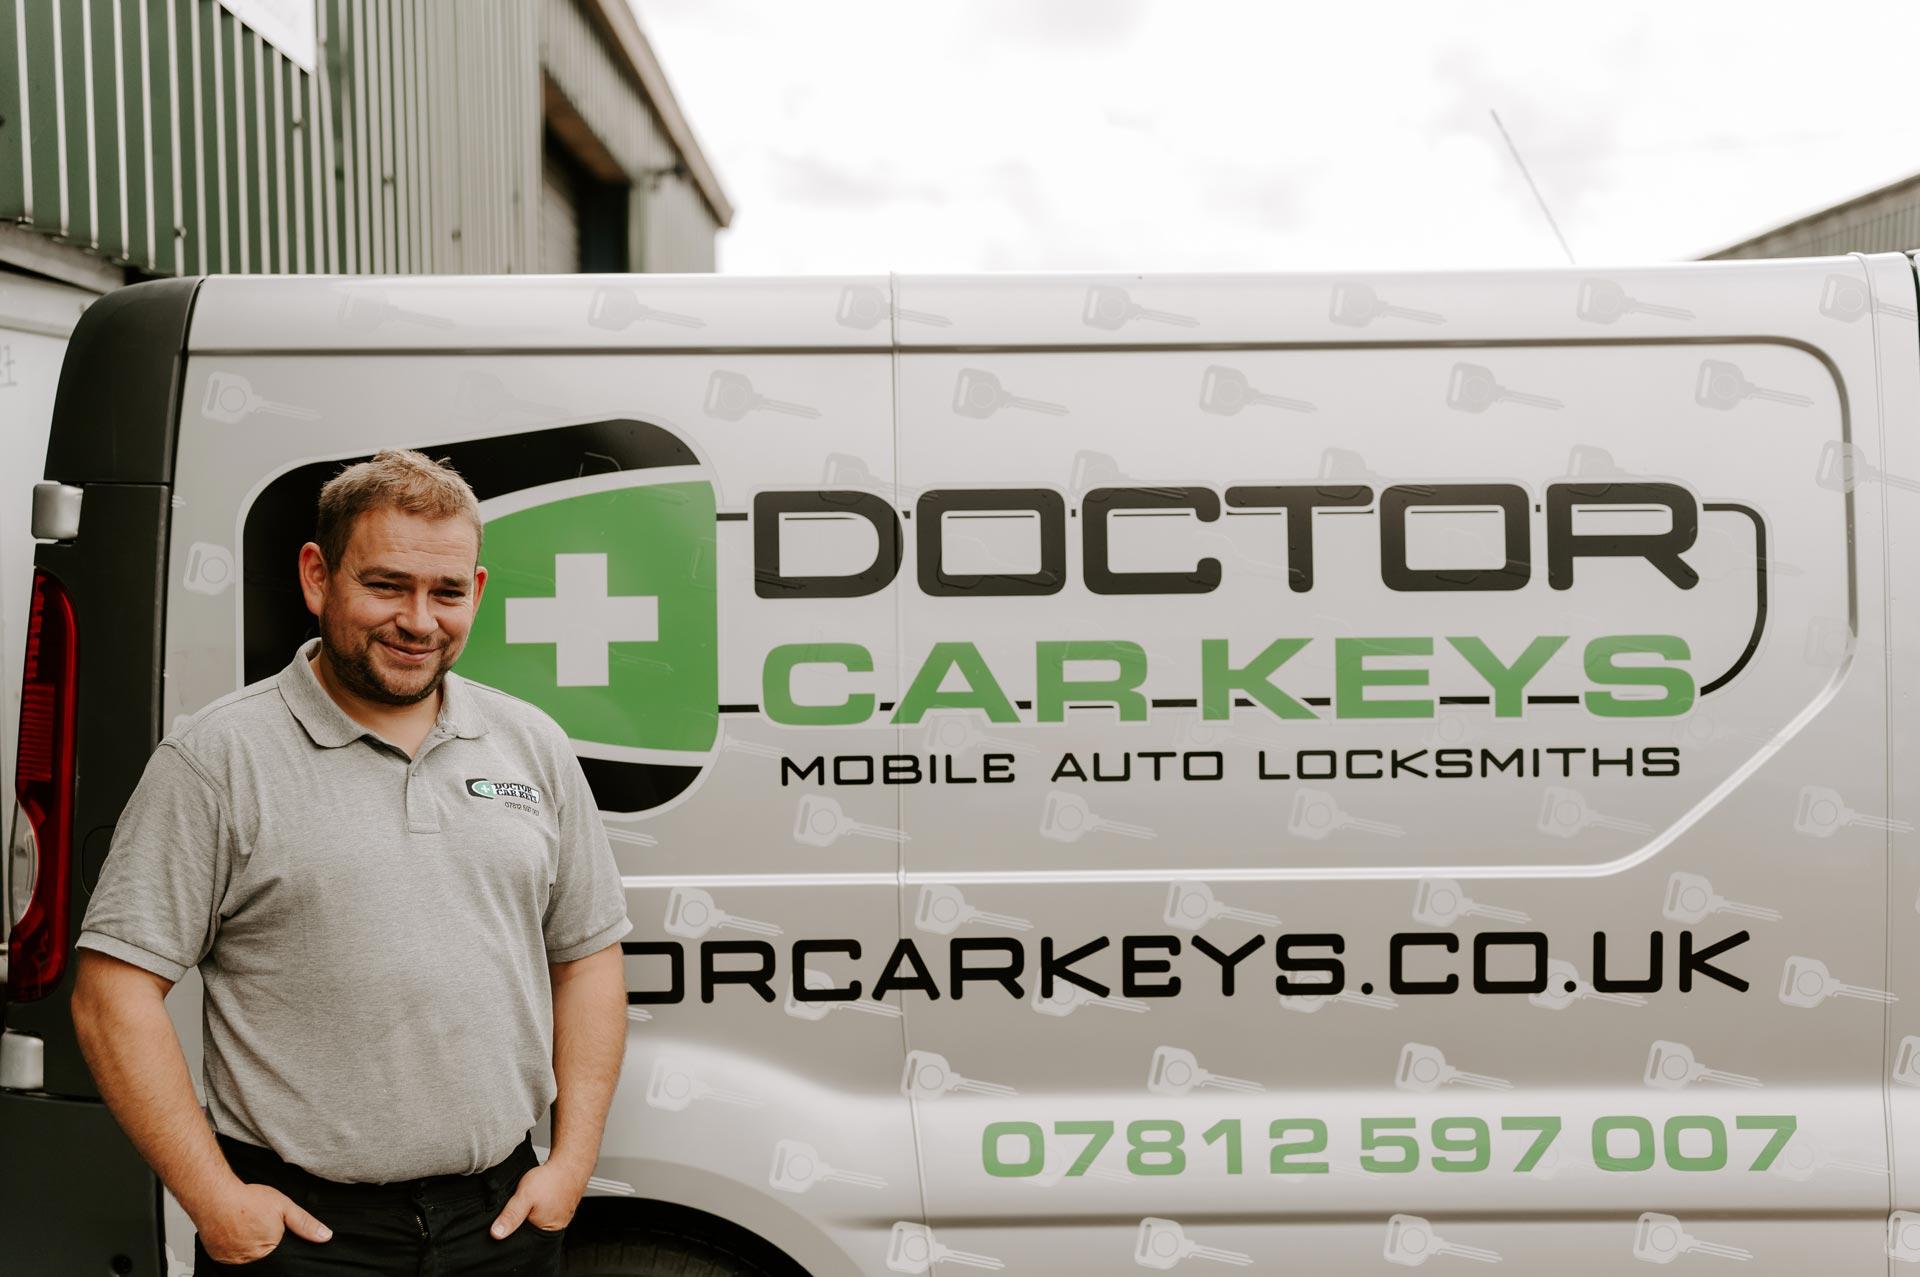 Auto Locksmiths in Slough